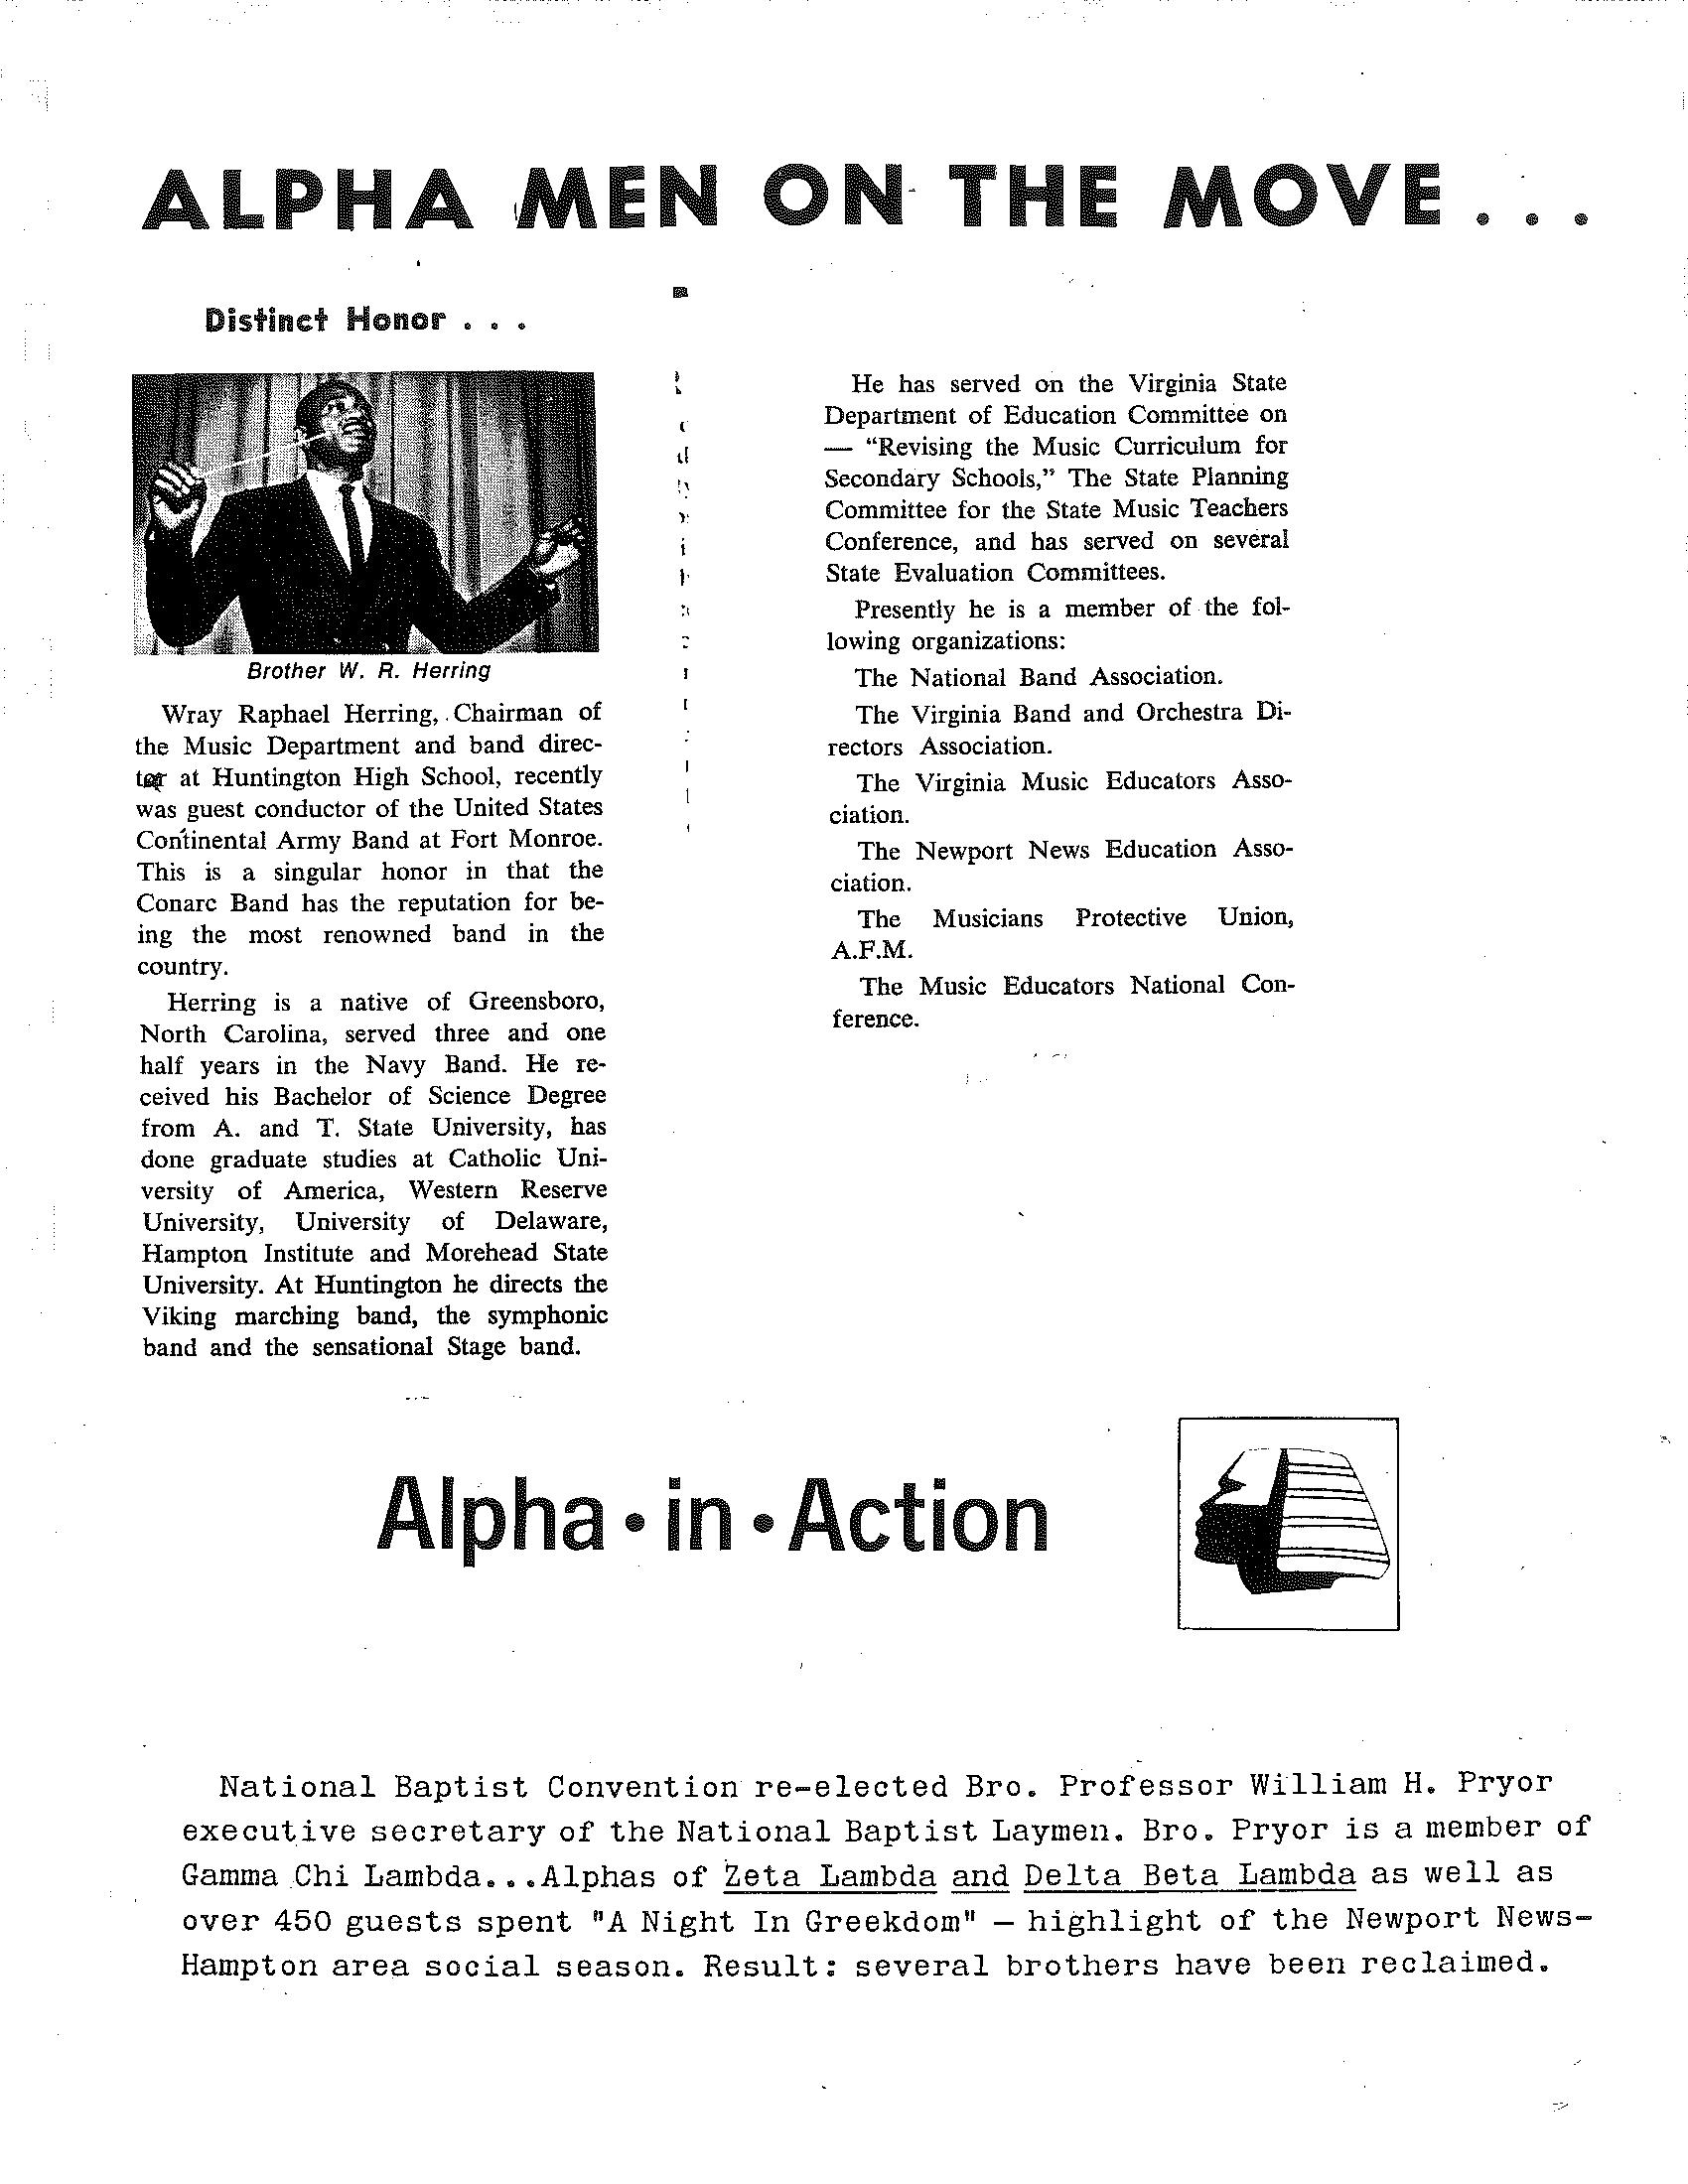 Zeta Lambda 1960s - Alpha Men on the Move, Bro. Wray Herring-1.png